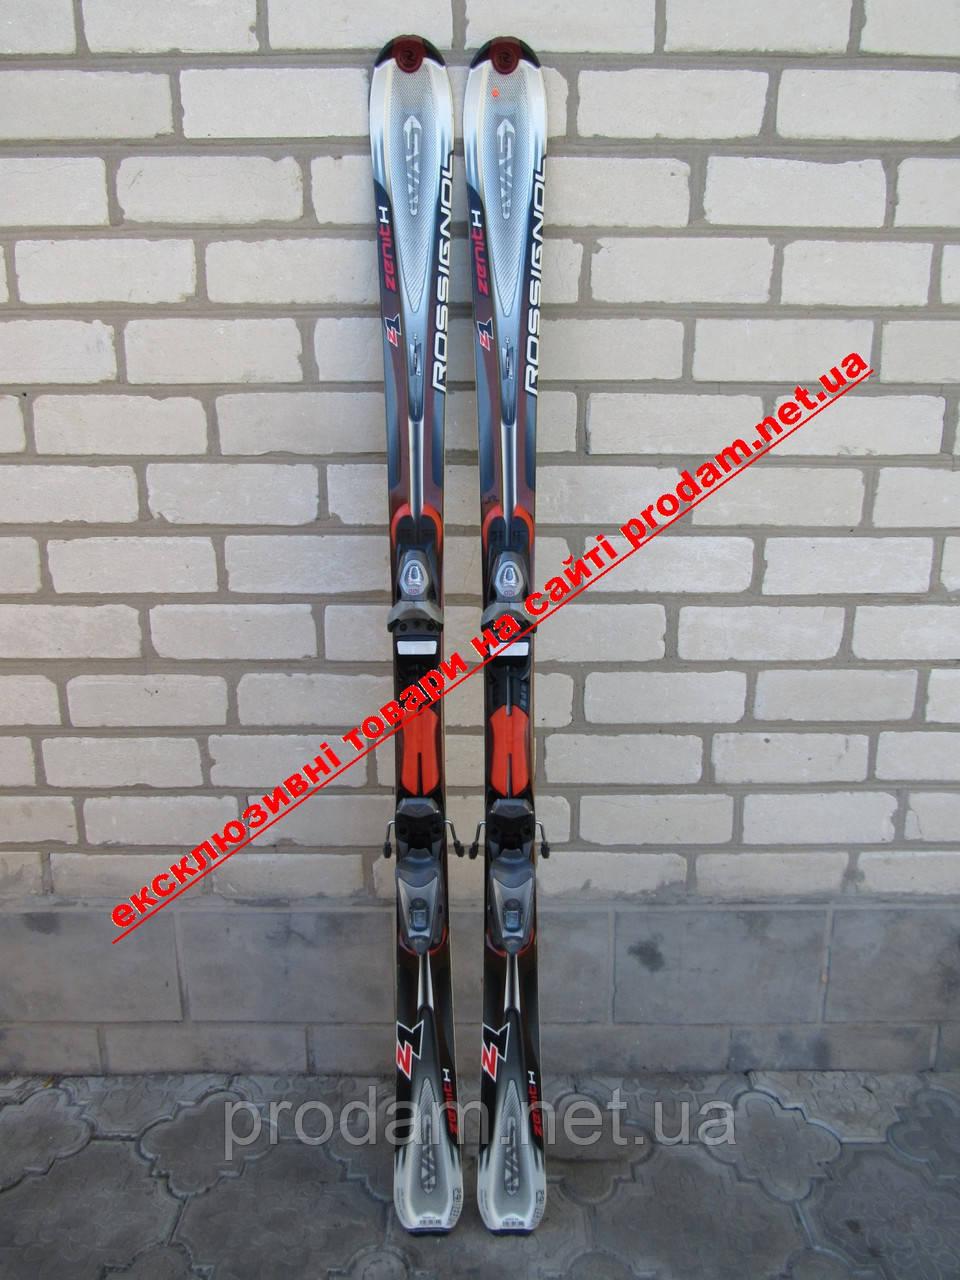 Лыжи Rossignol 162 см